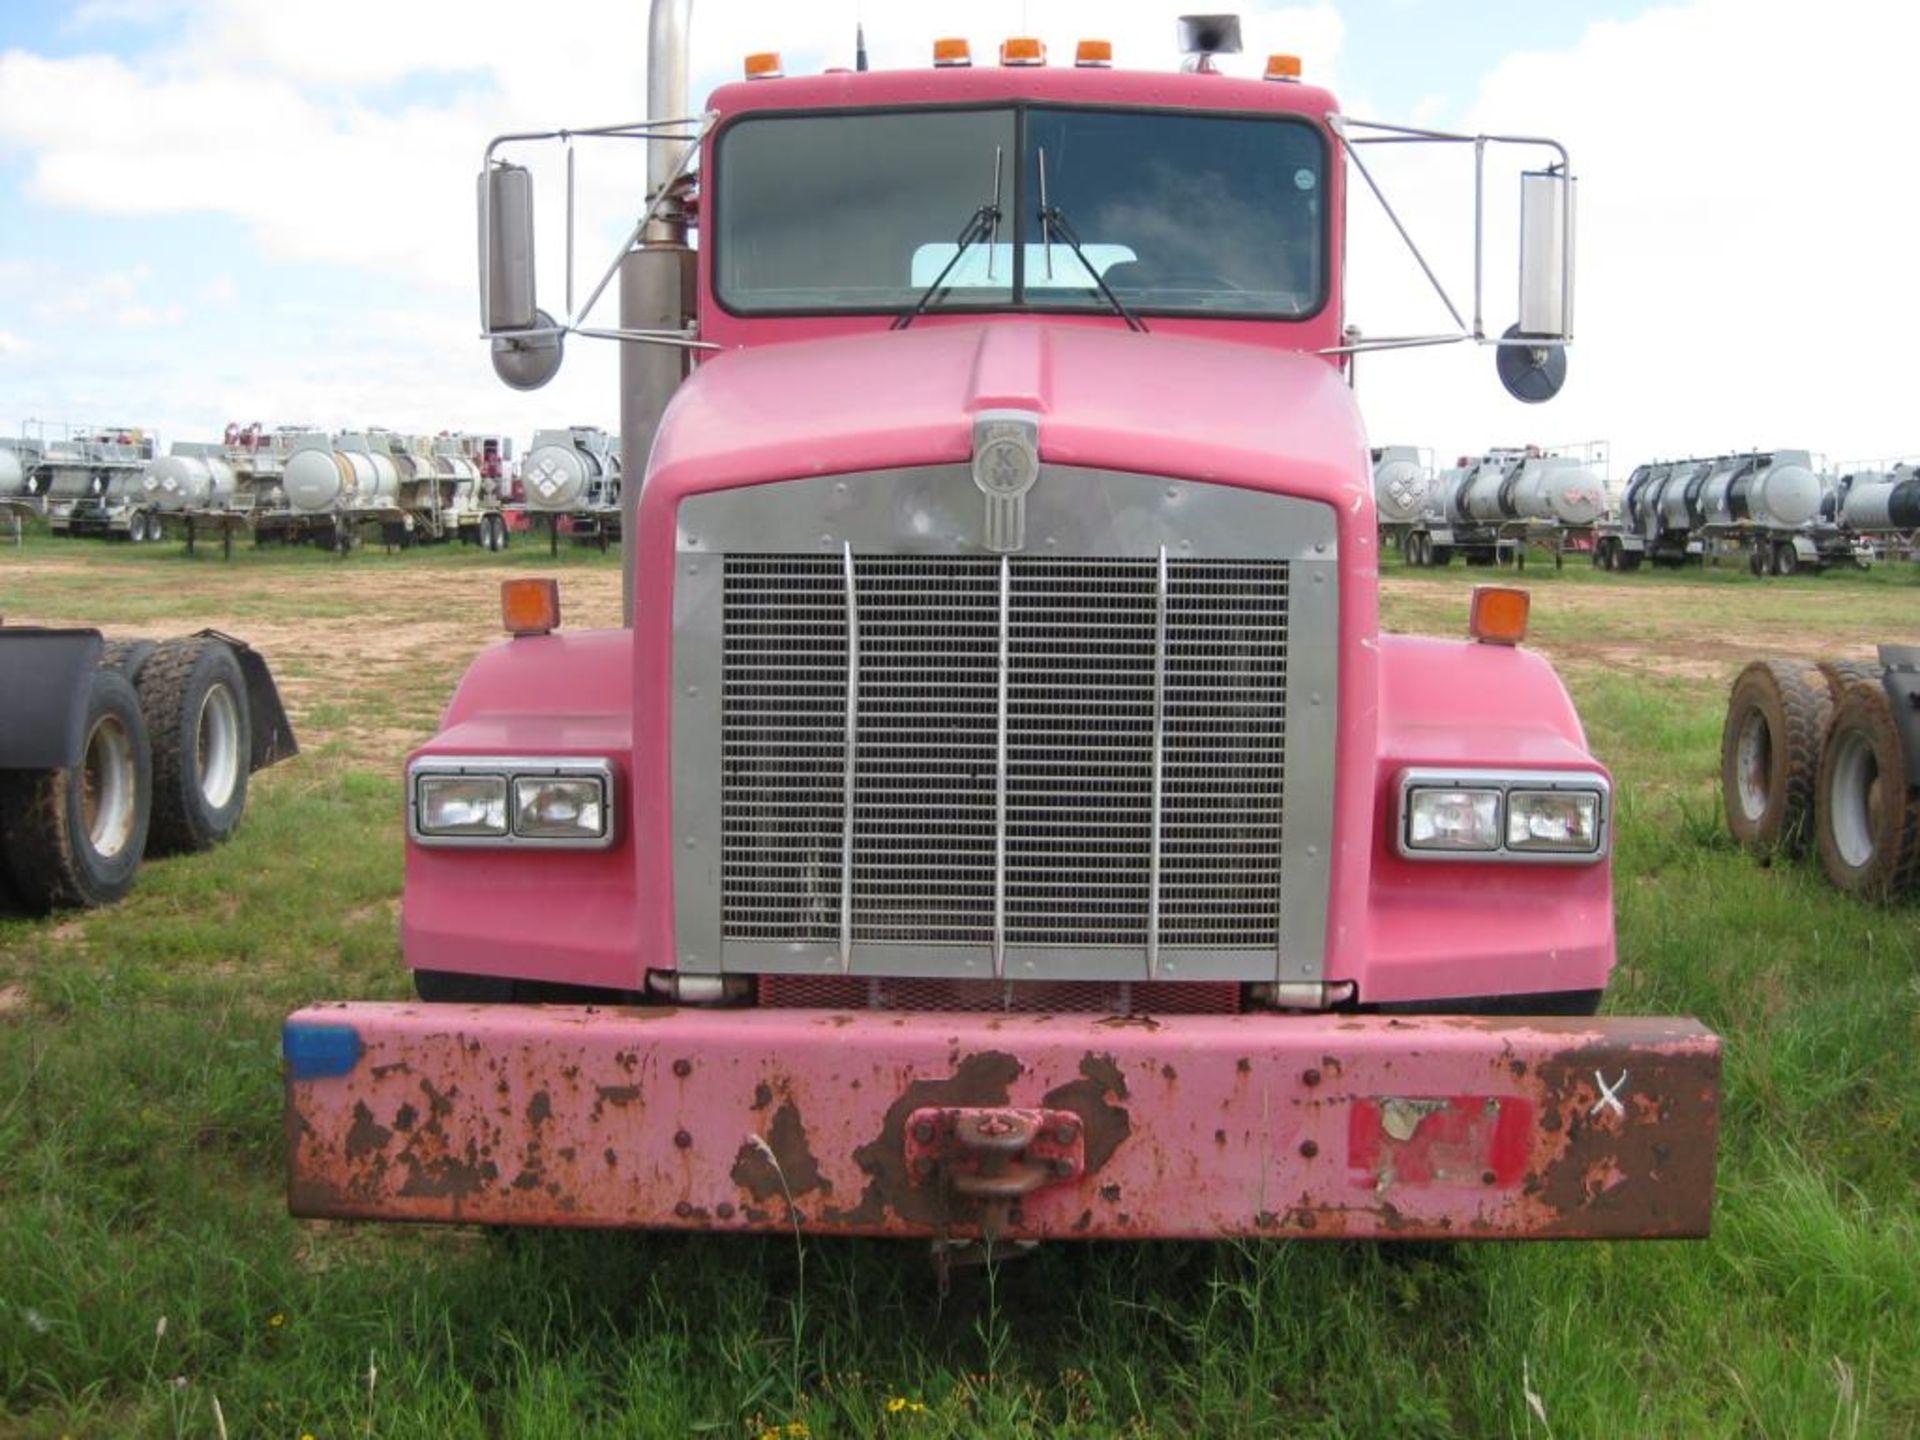 Kenworth Winch Truck - Image 3 of 23